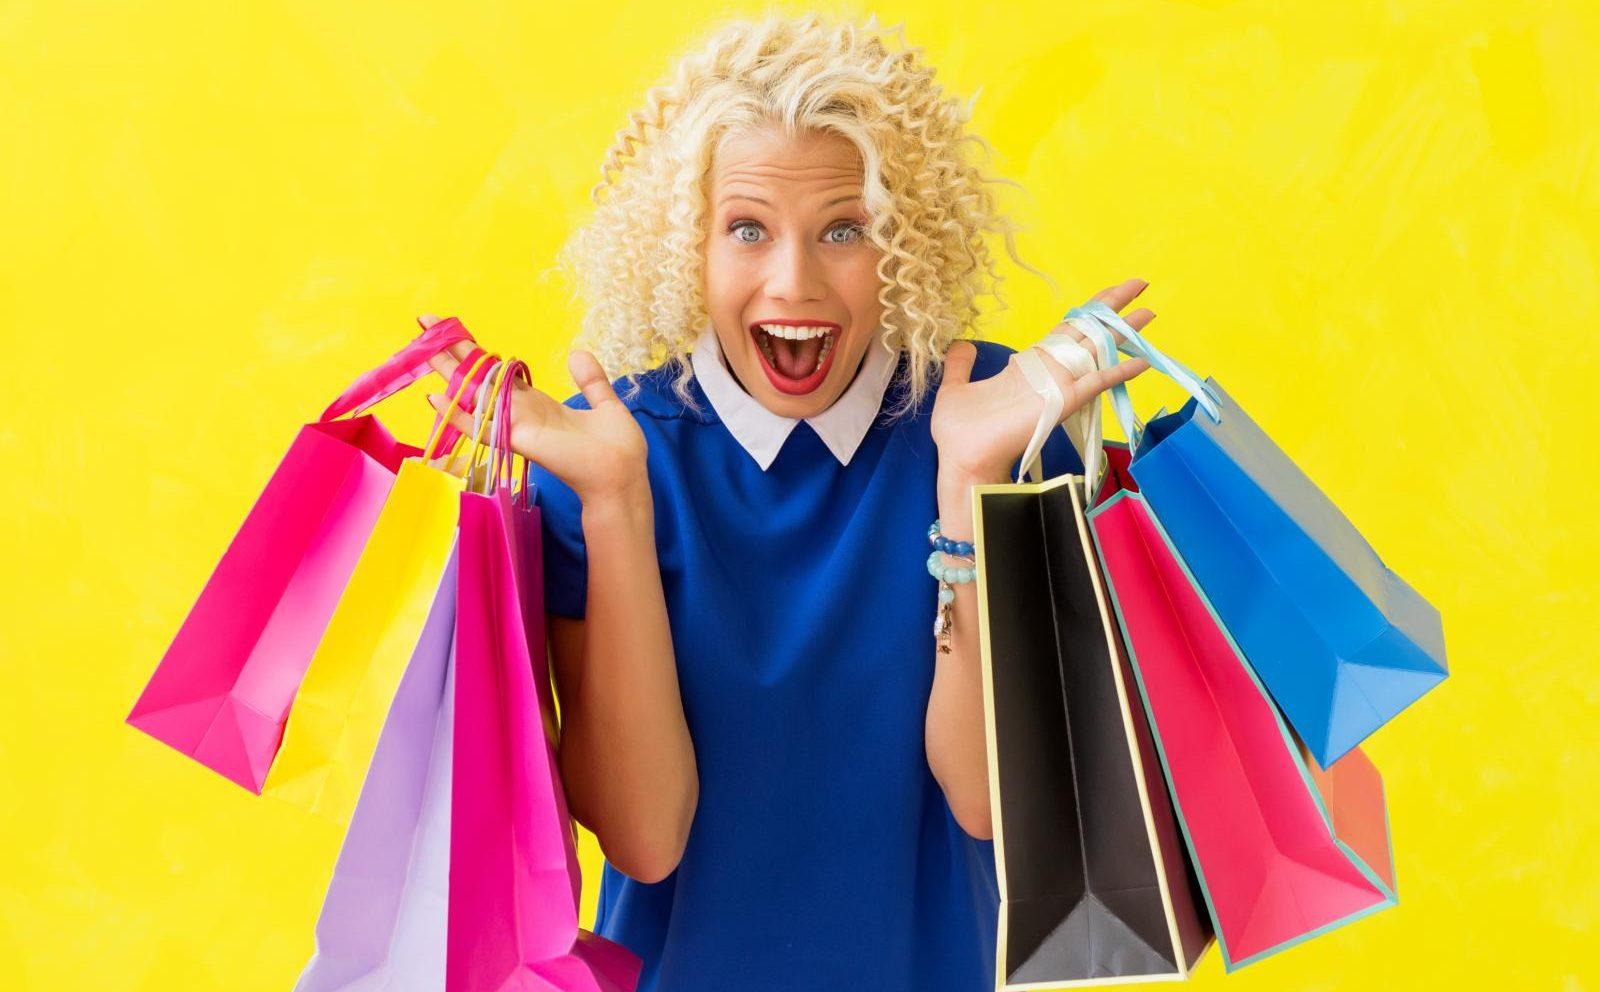 How to take advantage of end of season sale